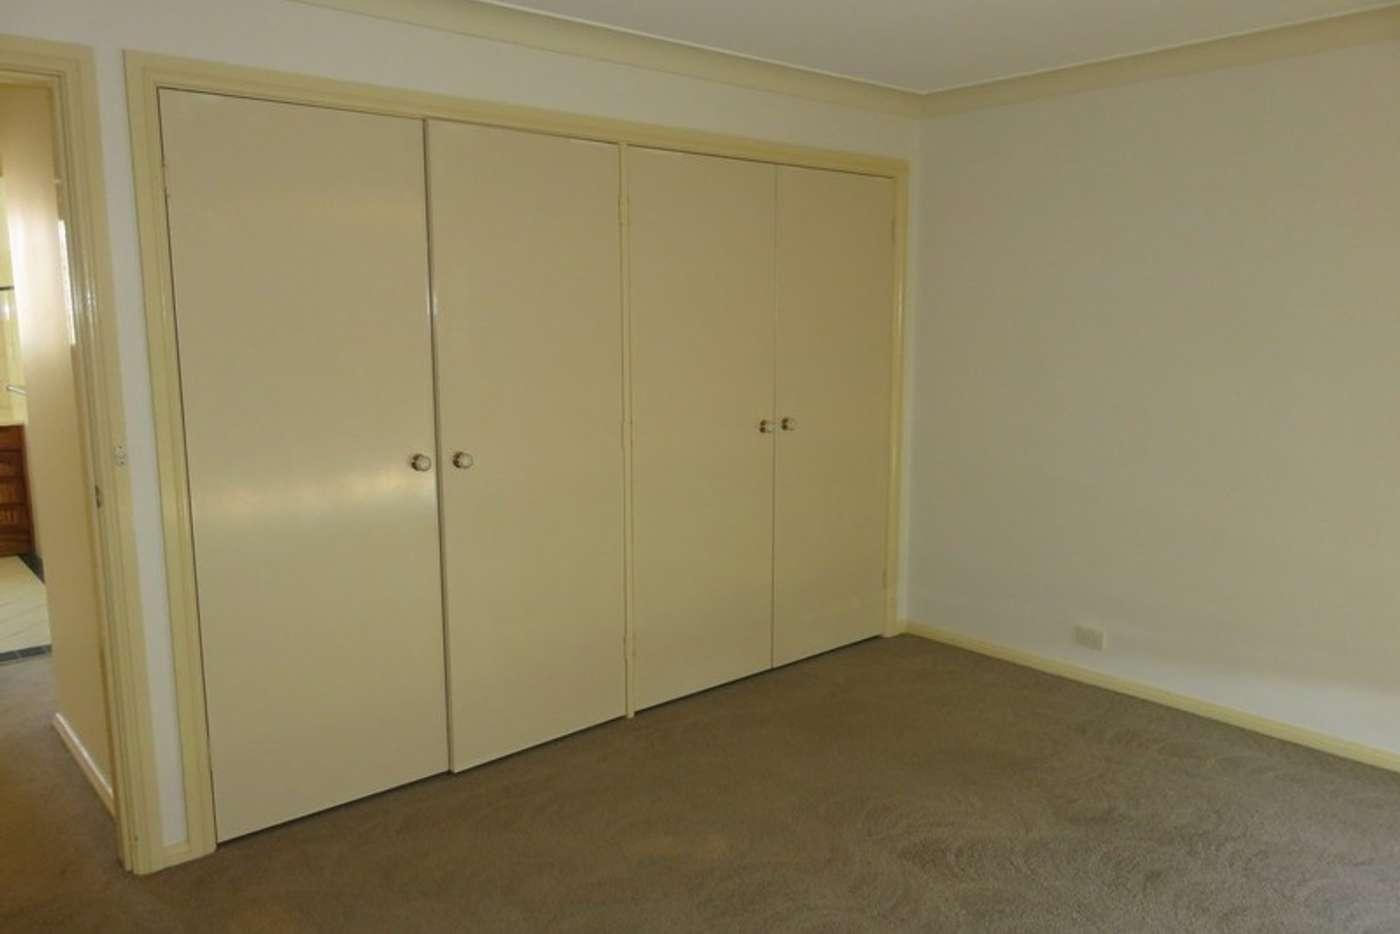 Sixth view of Homely unit listing, 2/21 Kimberley Drive, Wagga Wagga NSW 2650